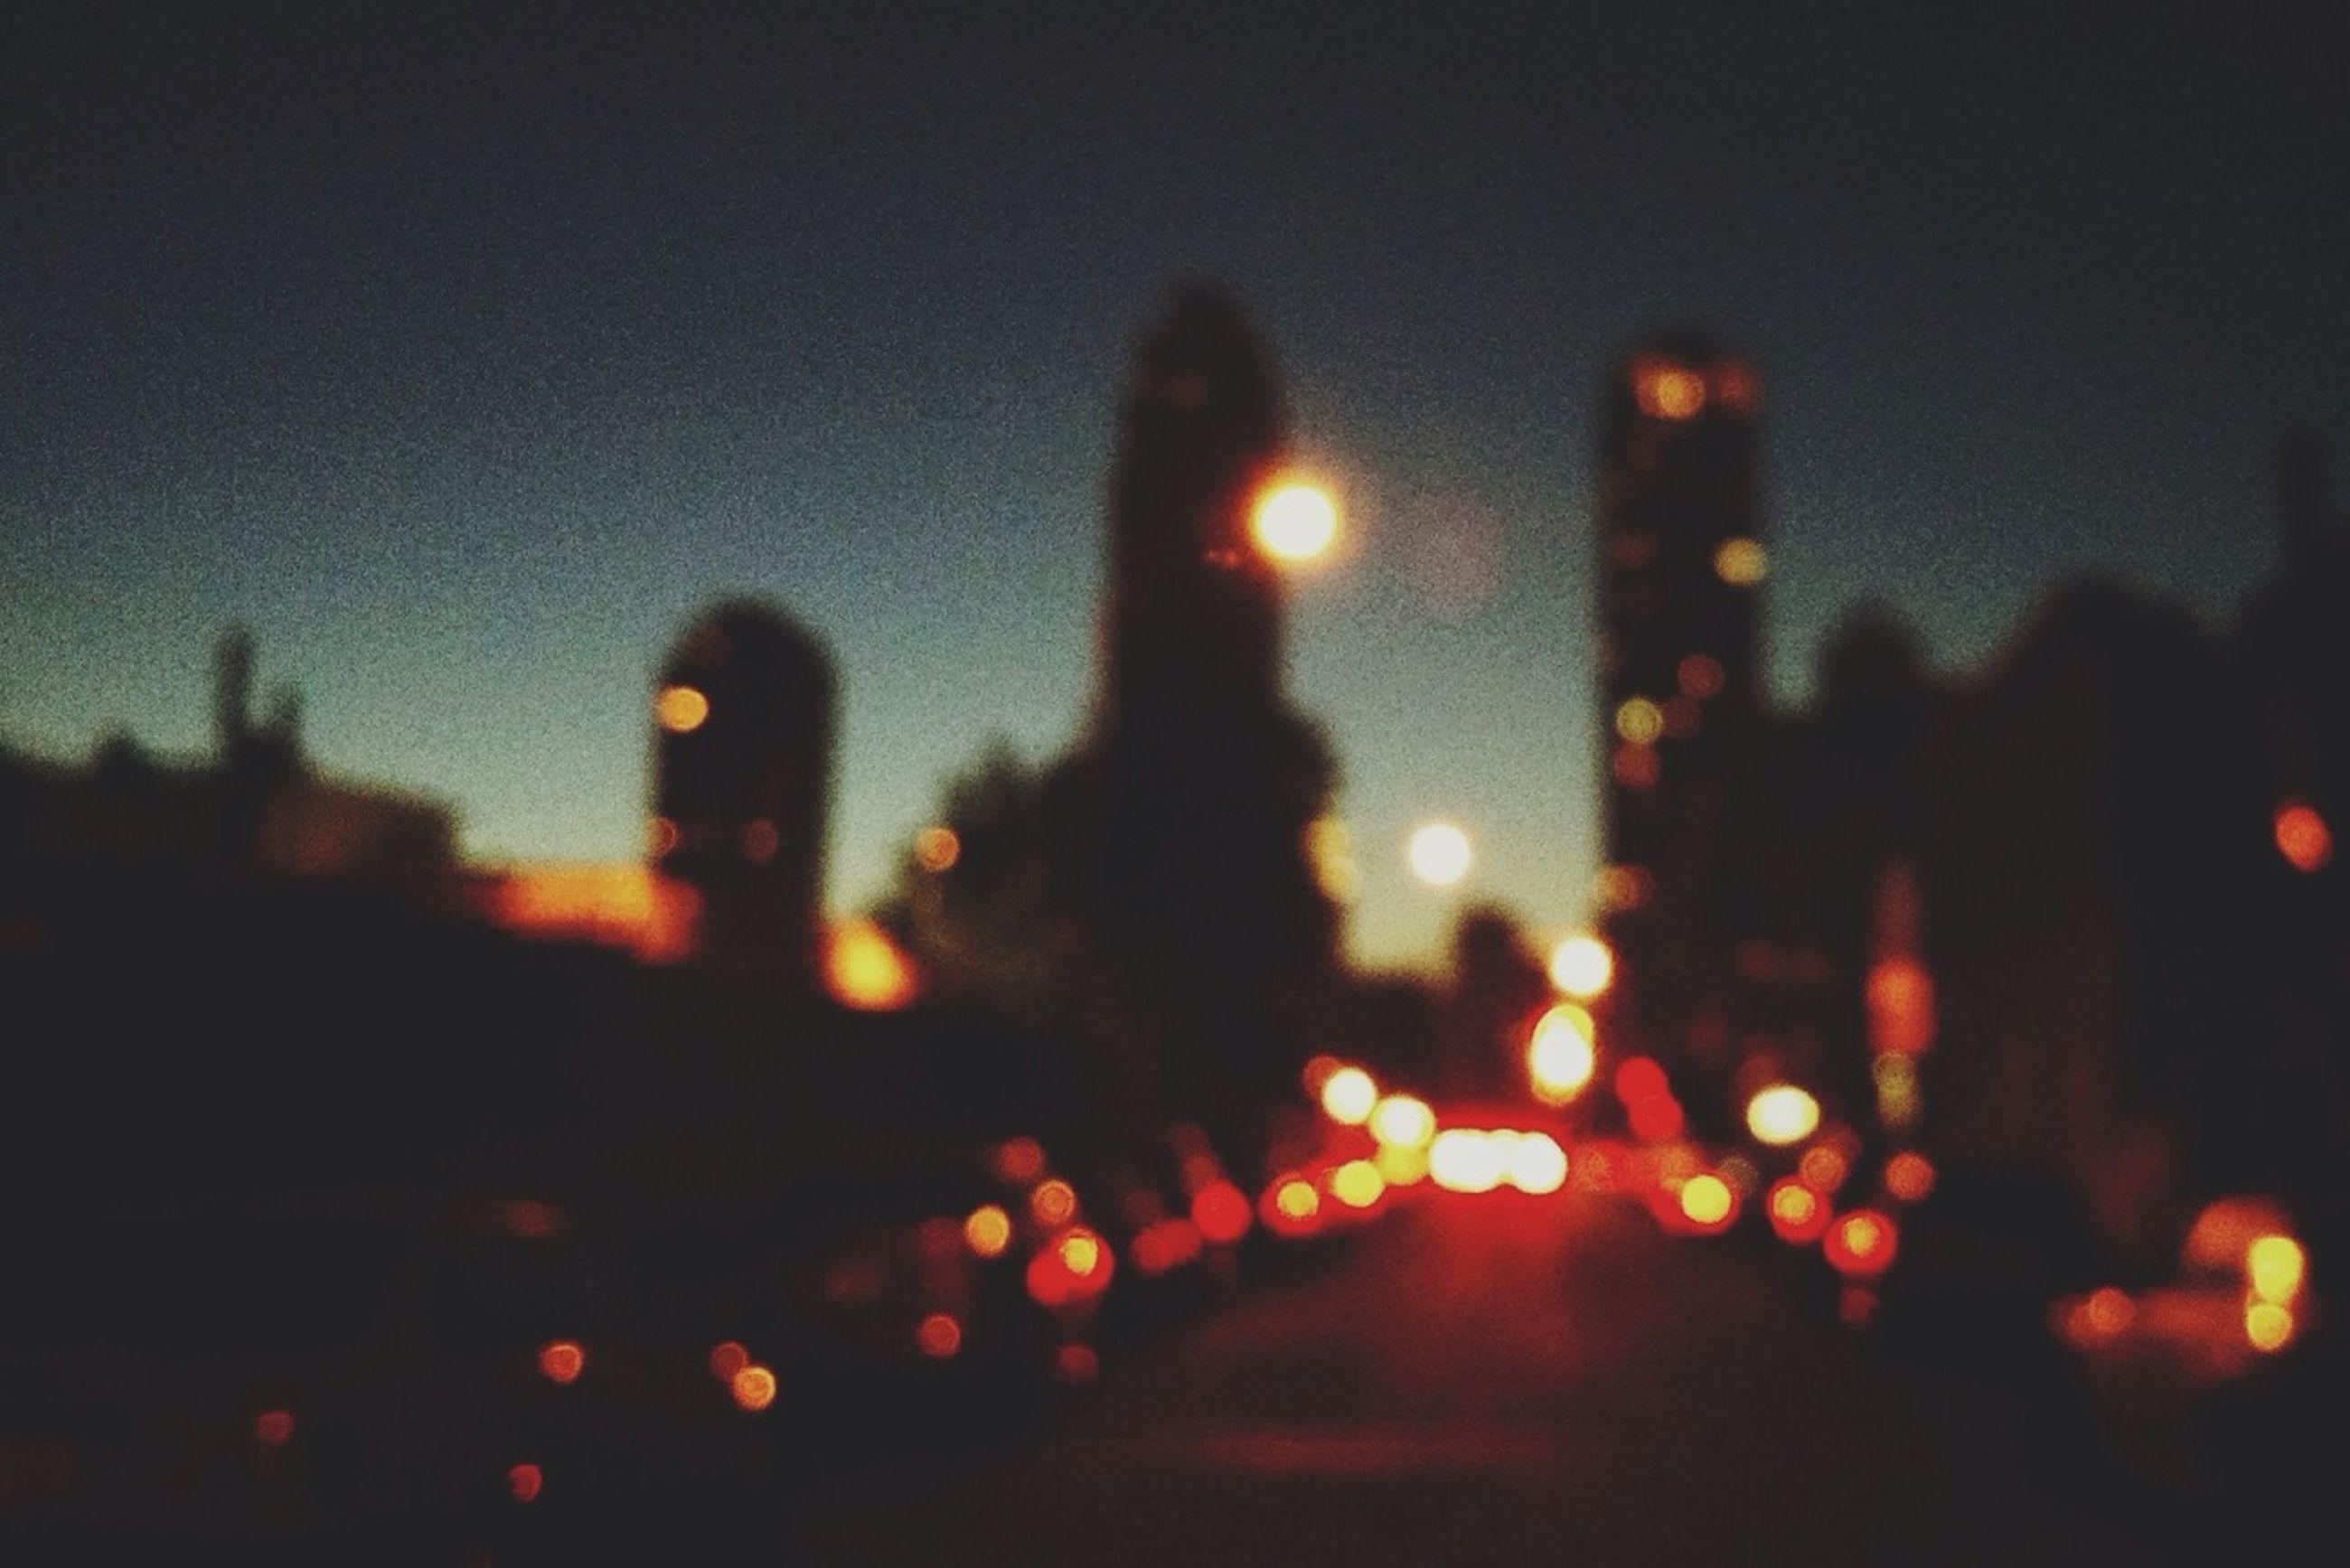 illuminated, night, city, building exterior, defocused, architecture, built structure, street, street light, lighting equipment, light - natural phenomenon, lens flare, road, dark, city life, sky, glowing, cityscape, outdoors, light